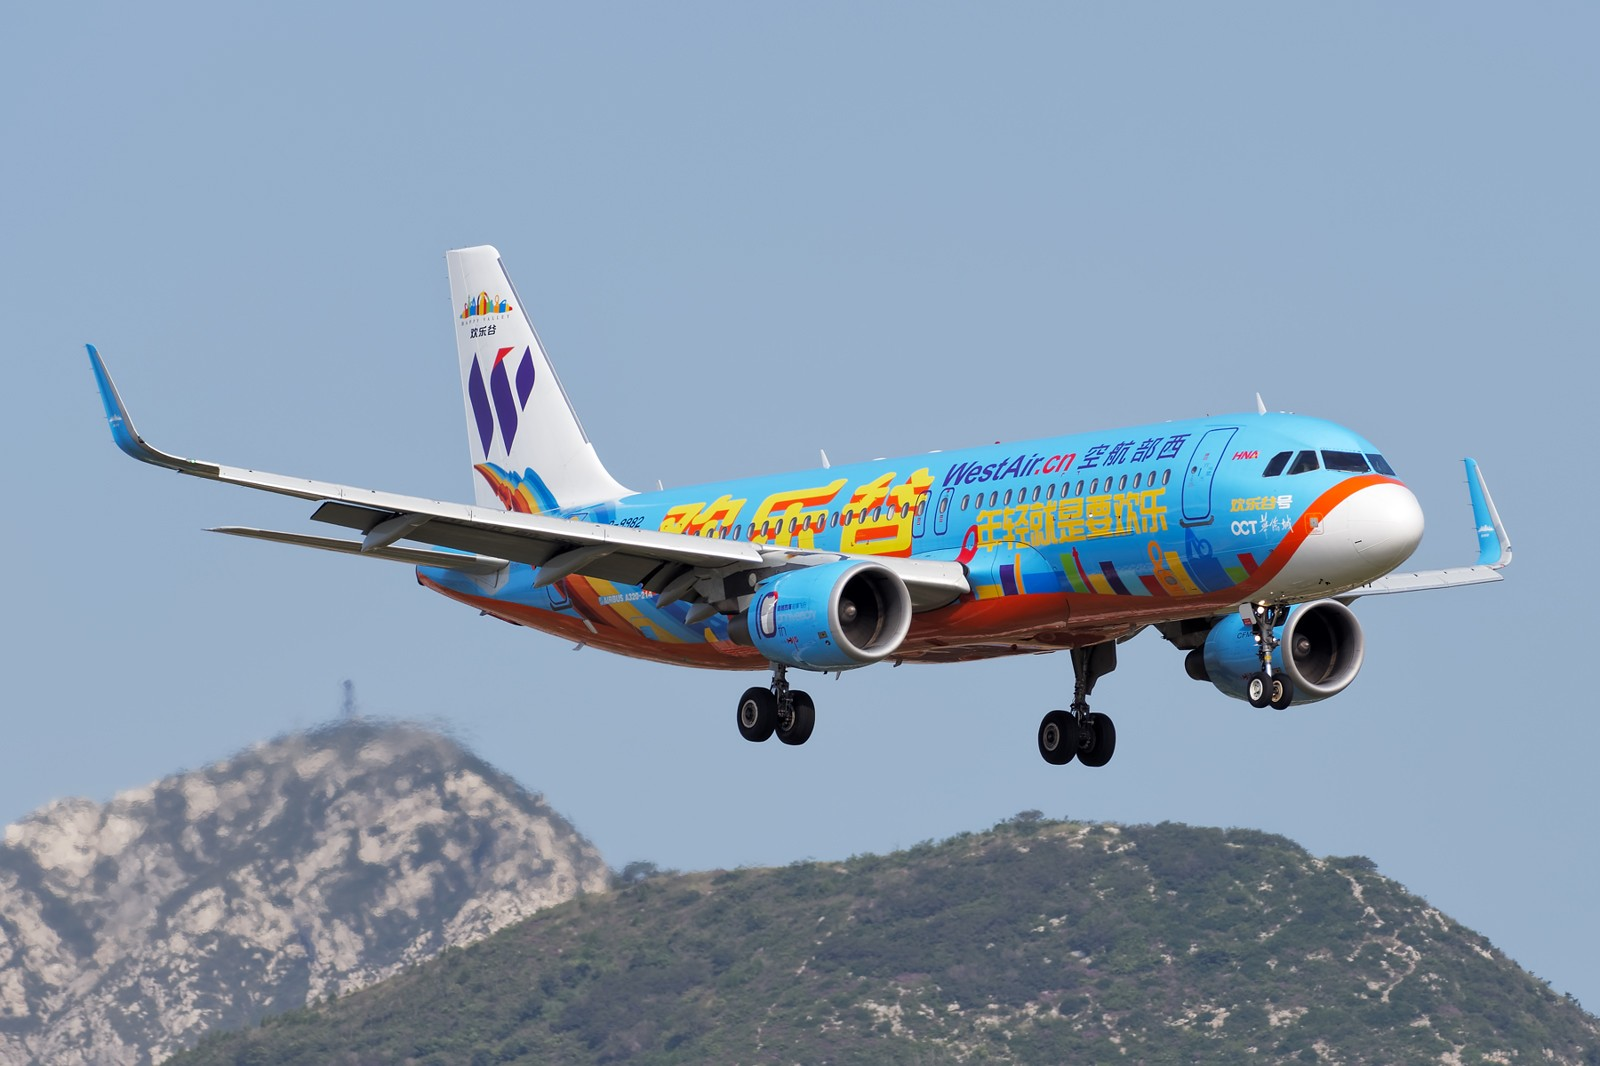 Re:[原创]★[DLC]一点有趣的事情(国庆加点儿料)★ AIRBUS A320-200 B-9982 中国大连国际机场